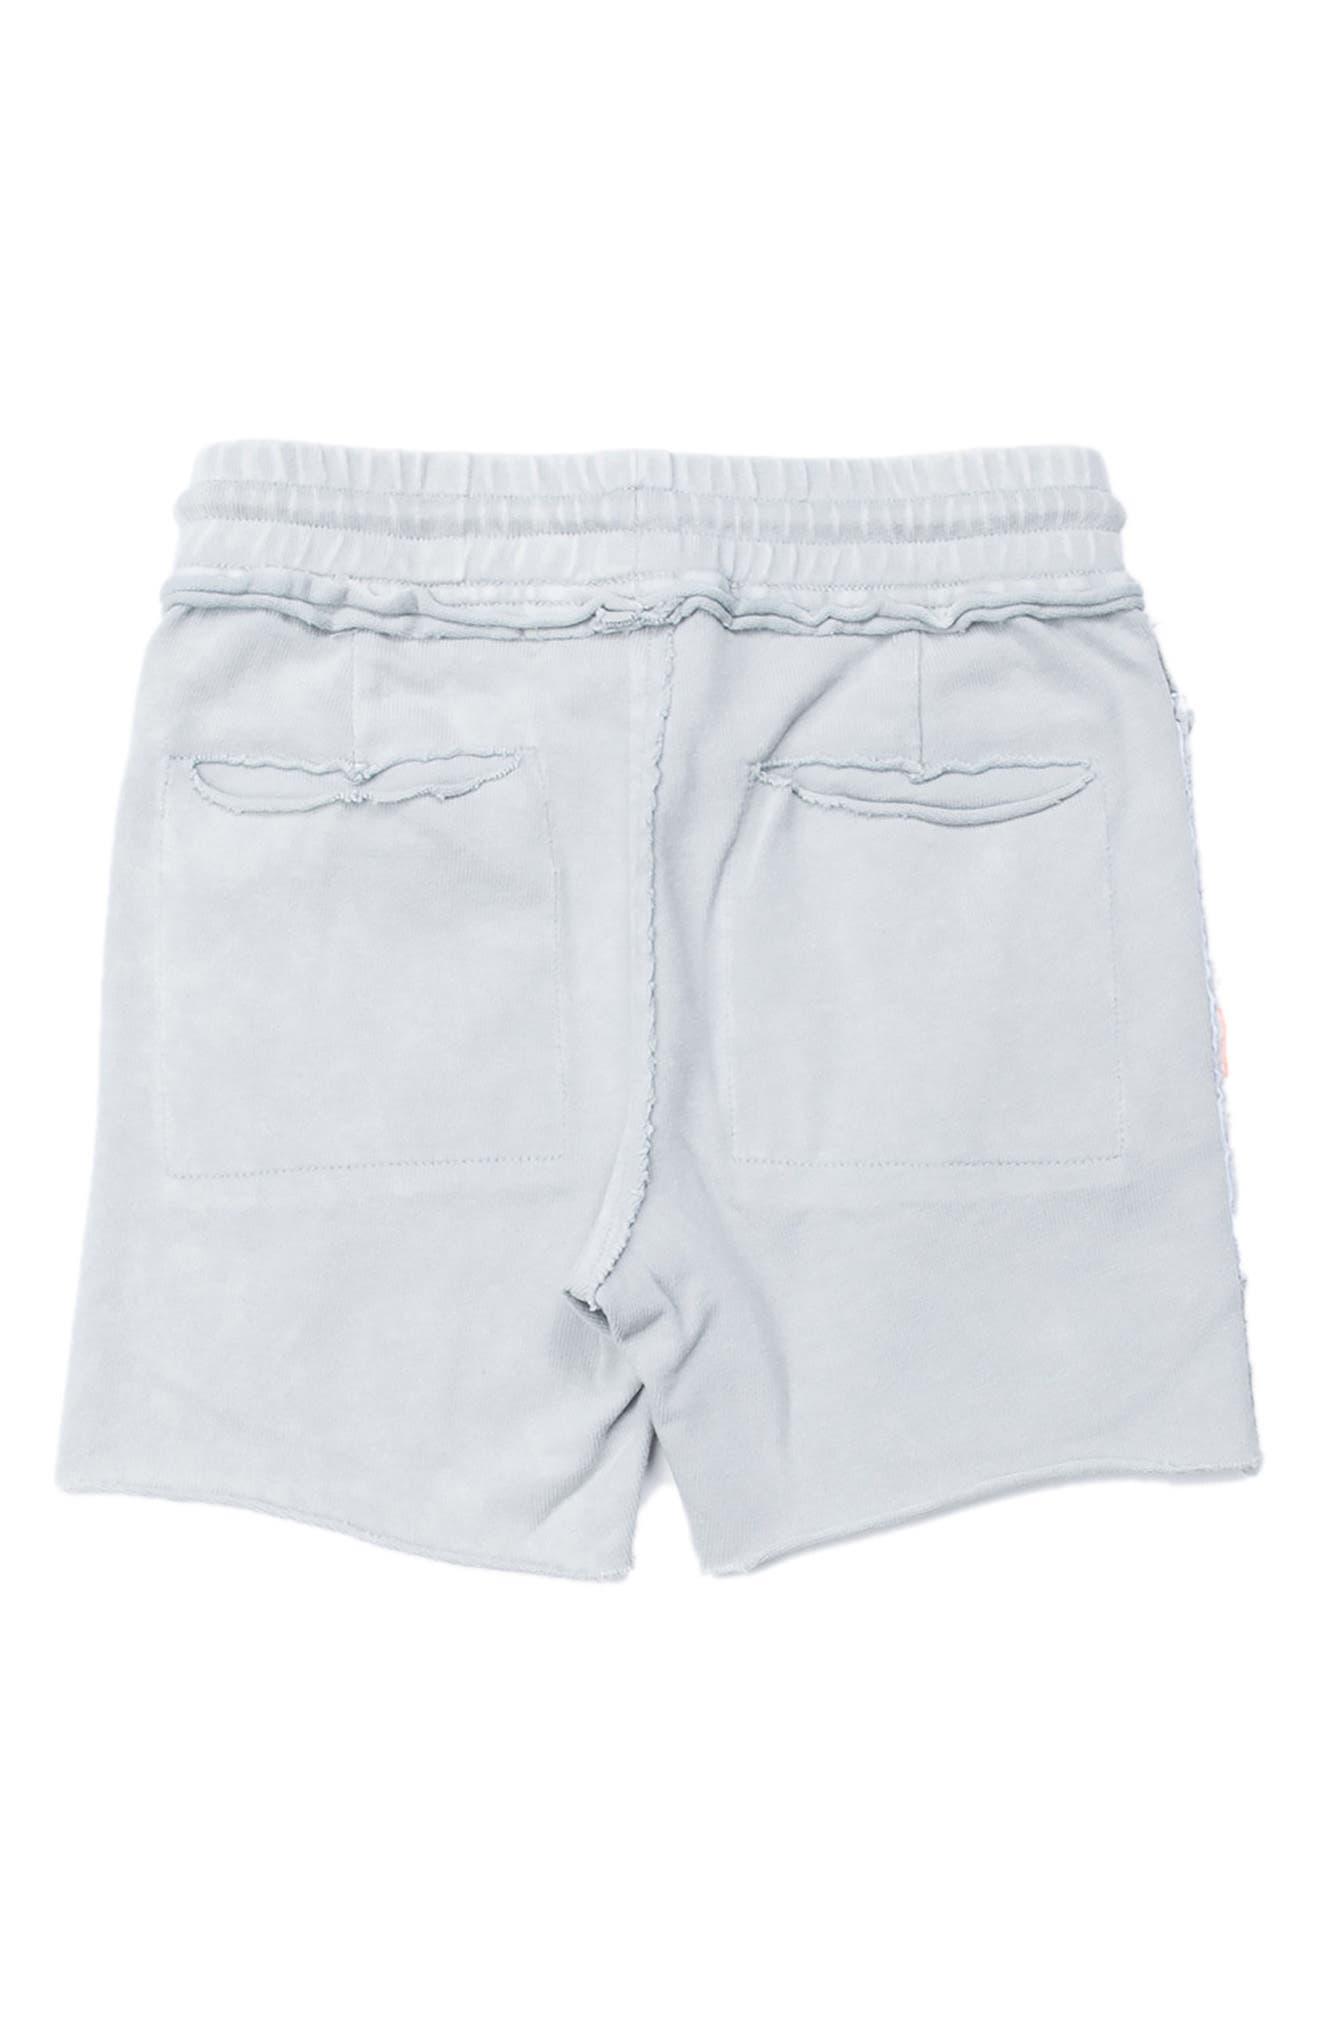 Kirk Distressed Shorts,                             Alternate thumbnail 2, color,                             020